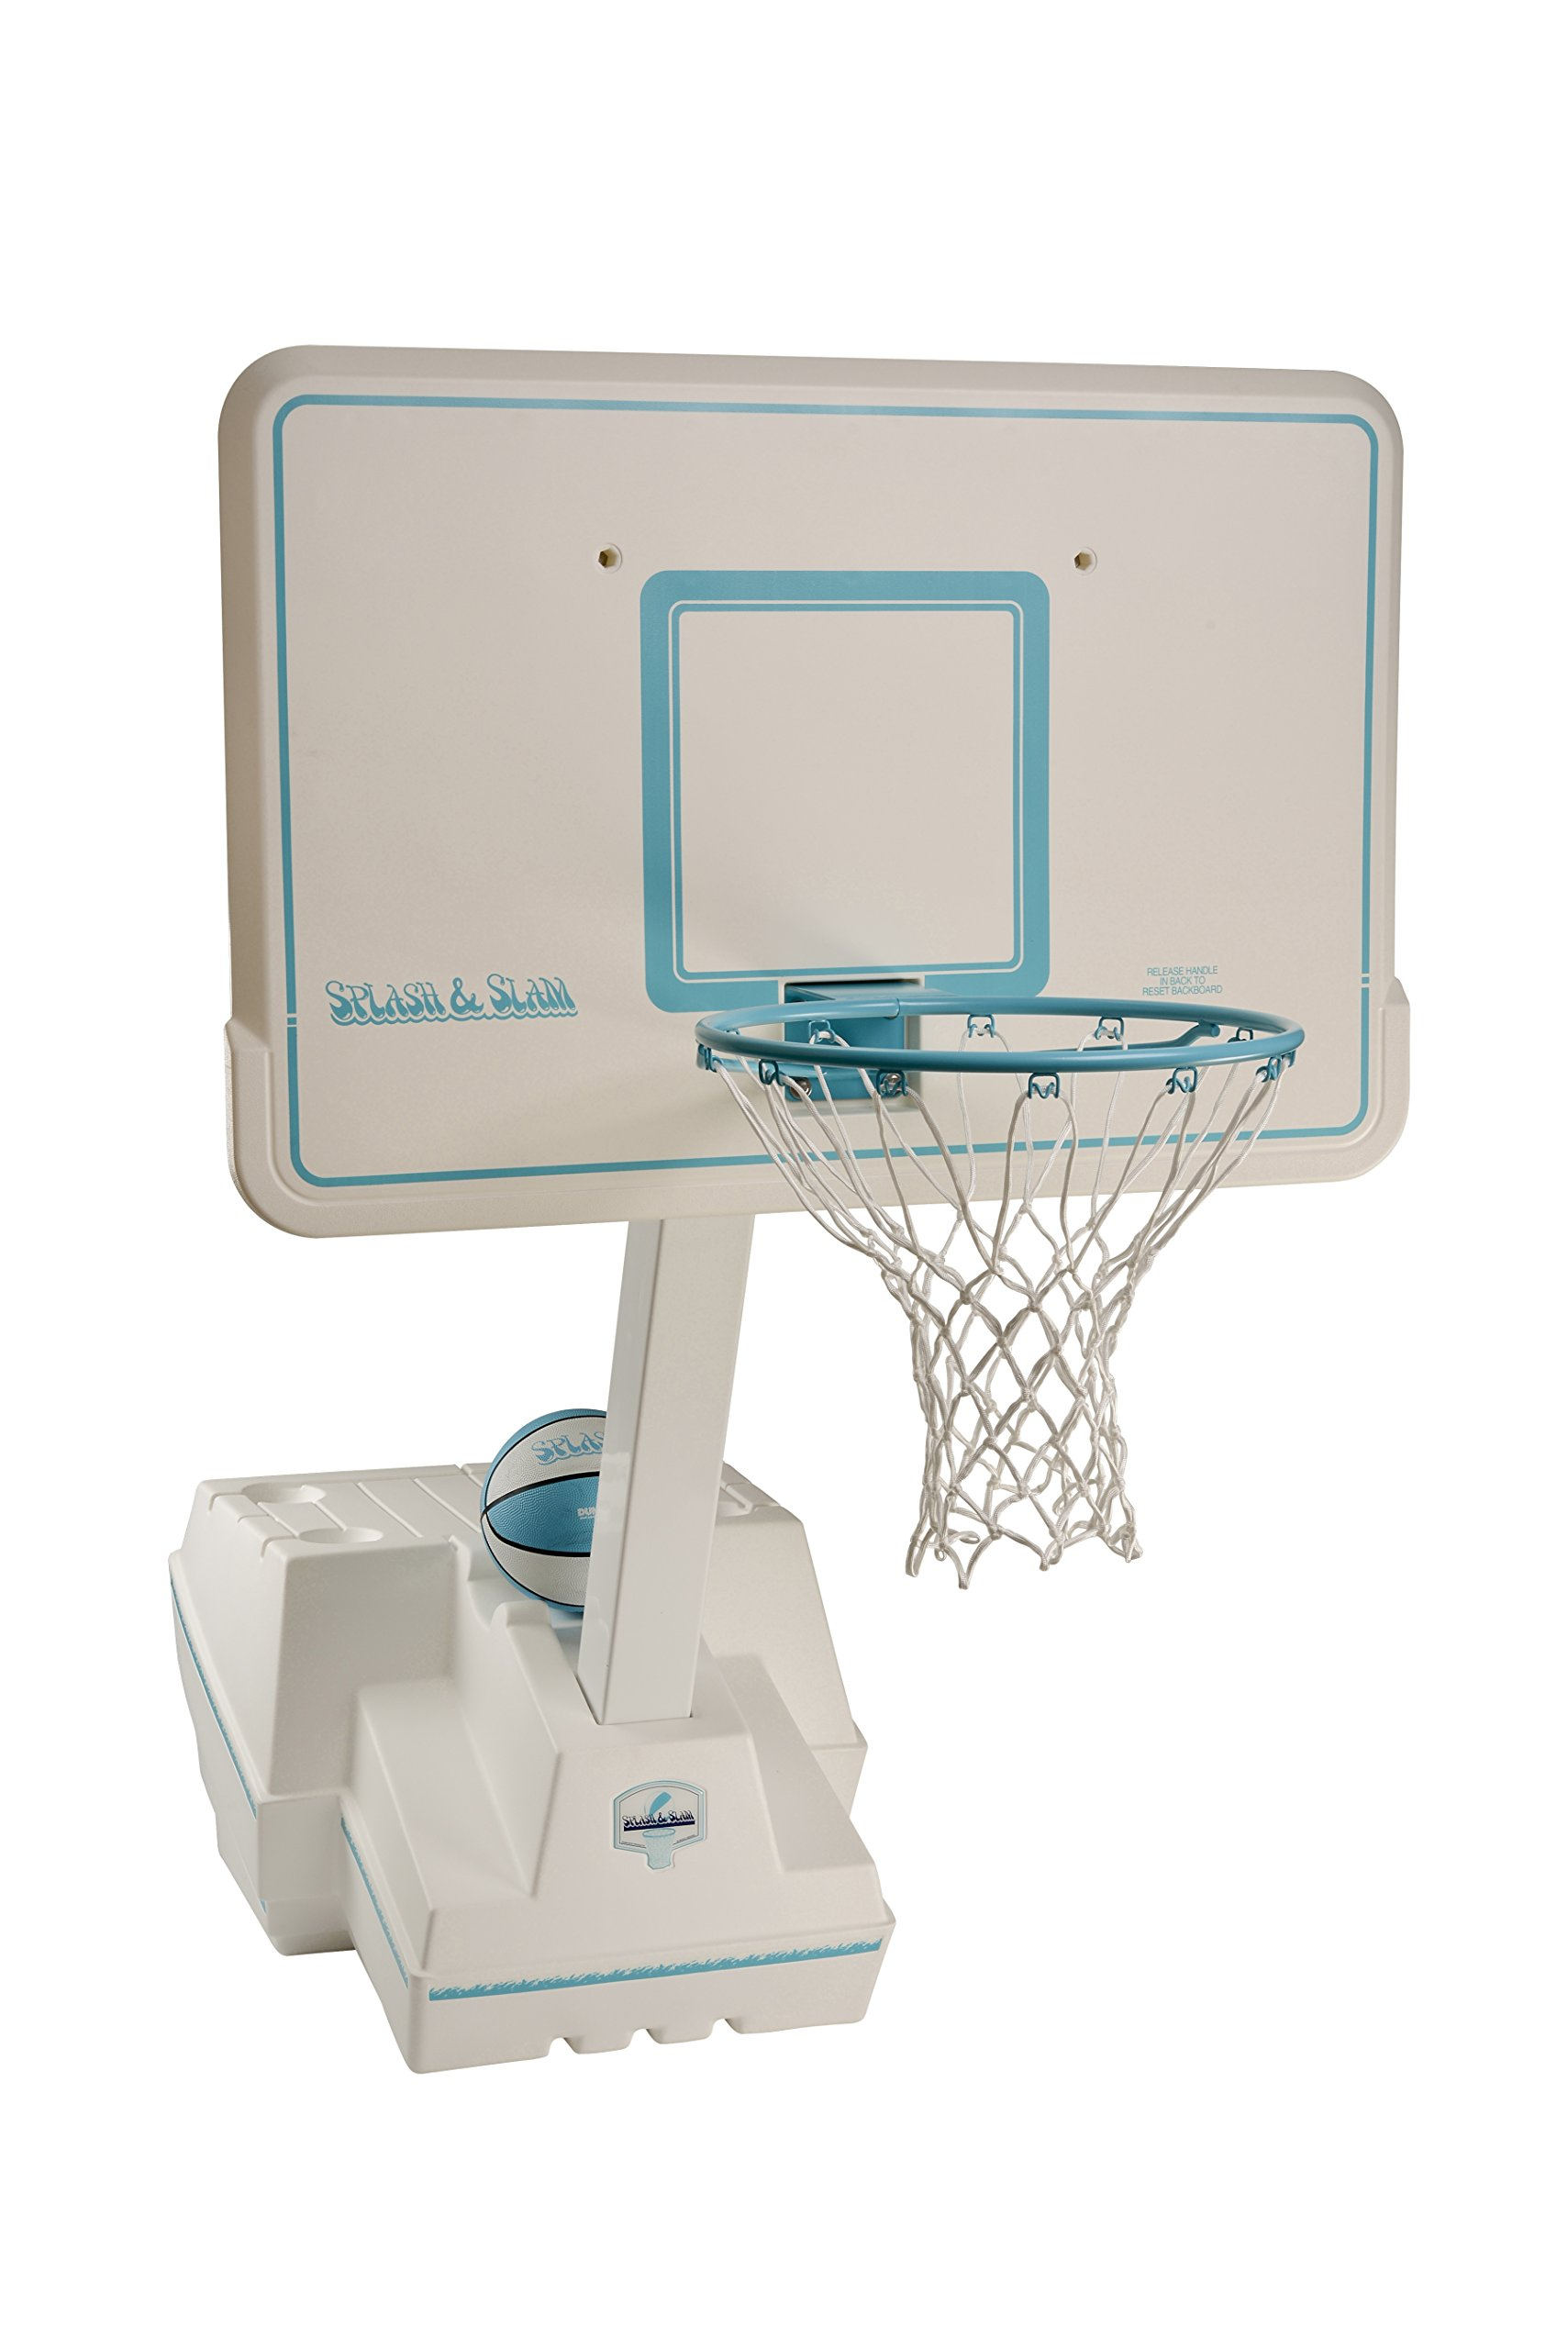 Dunnrite Splash and Slam Portable Swimming Pool Basketball Game Set